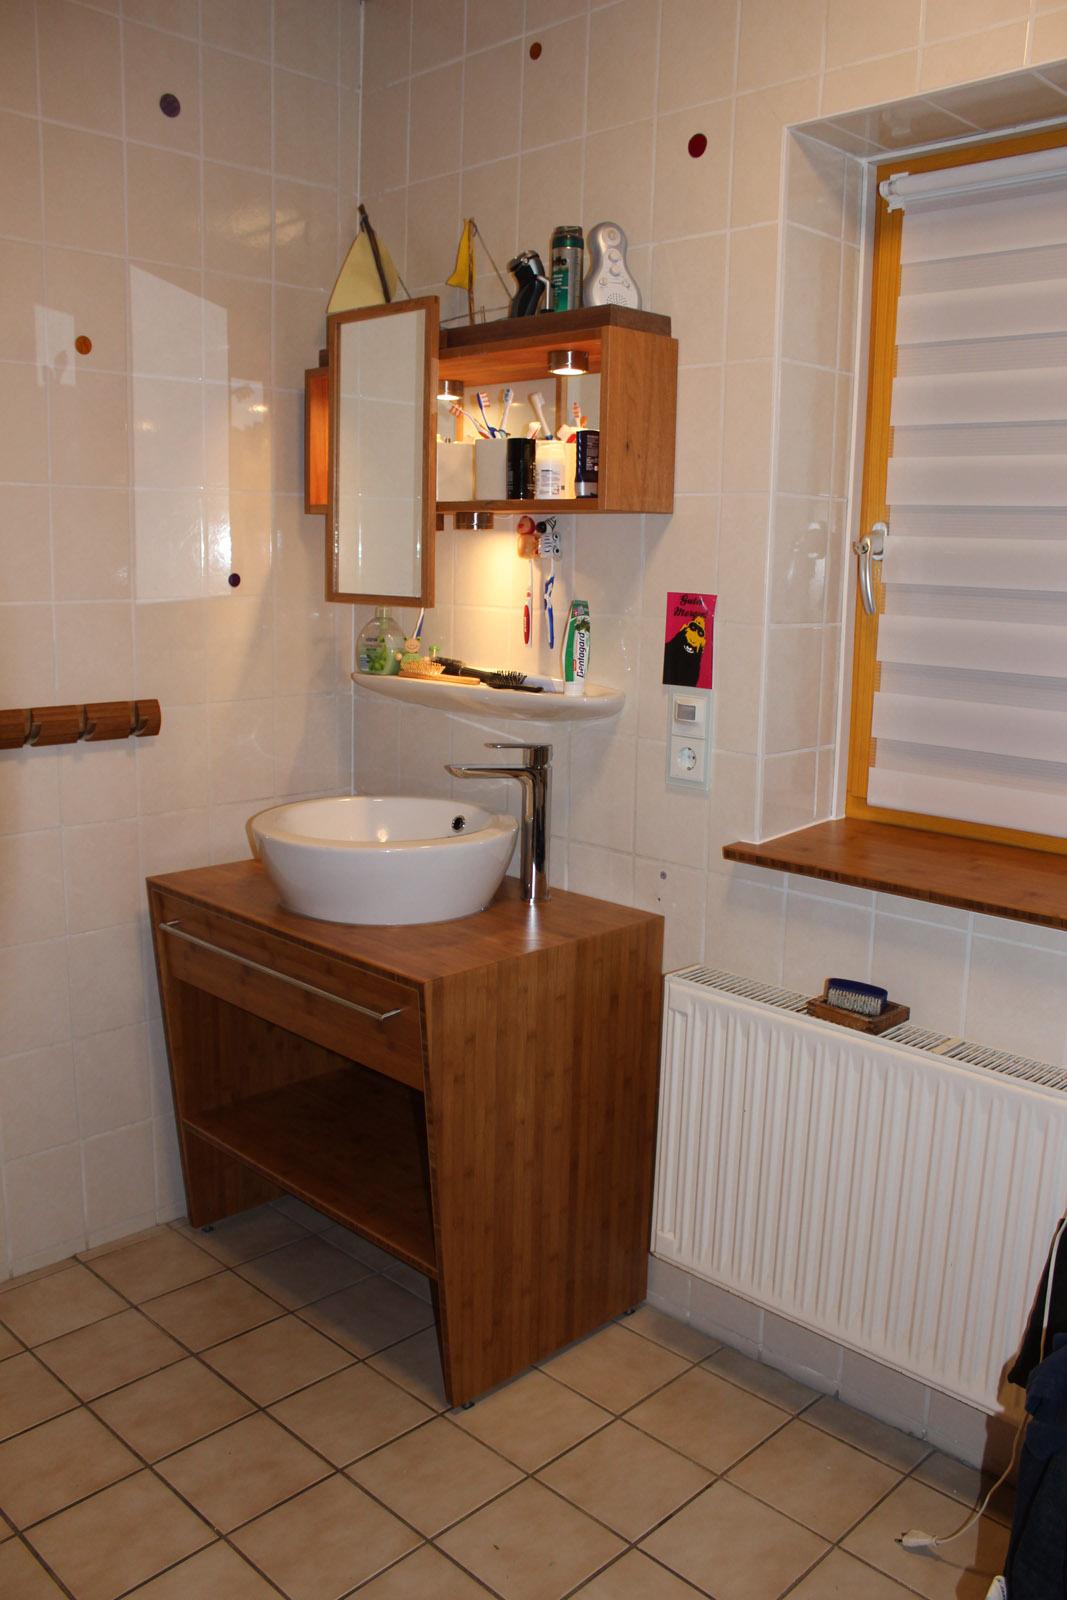 Badezimmerm bel bambus plattenwerkstoff projektwerkstatt - Badezimmermobel bambus ...